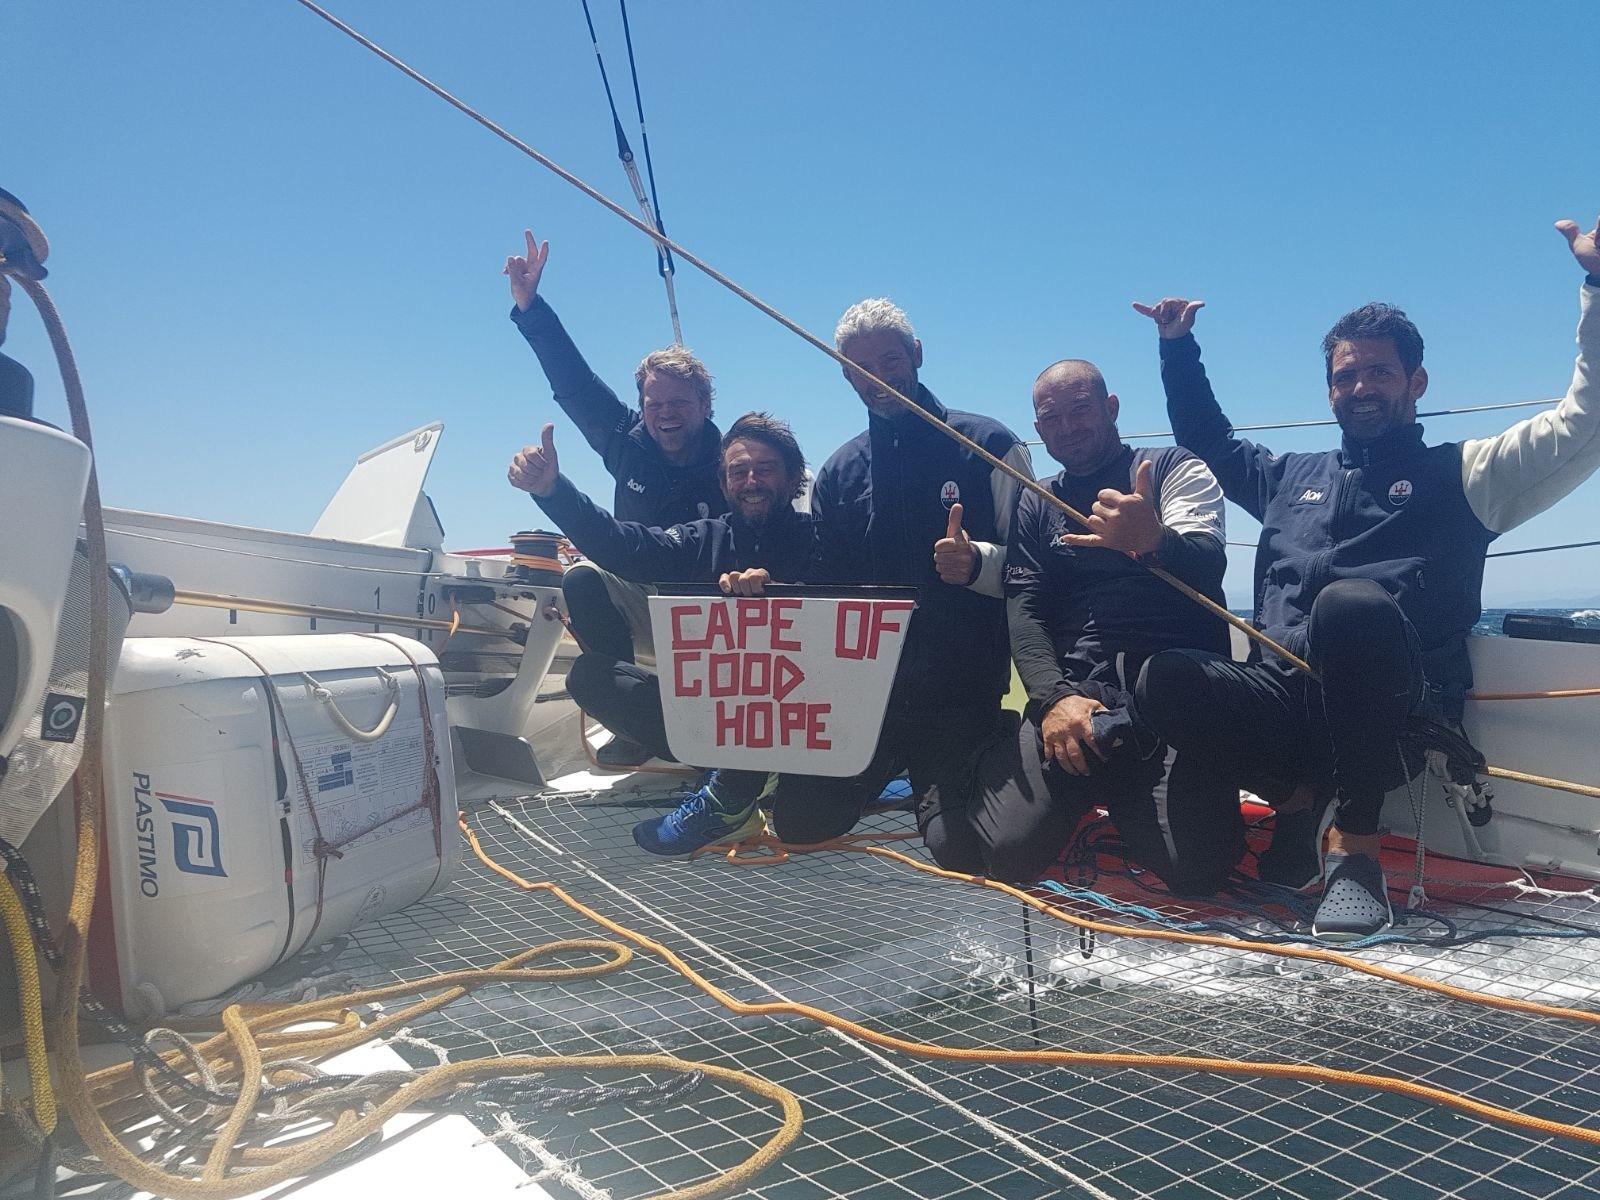 The Maserati crew celebrates passing the Cape of Good Hope.